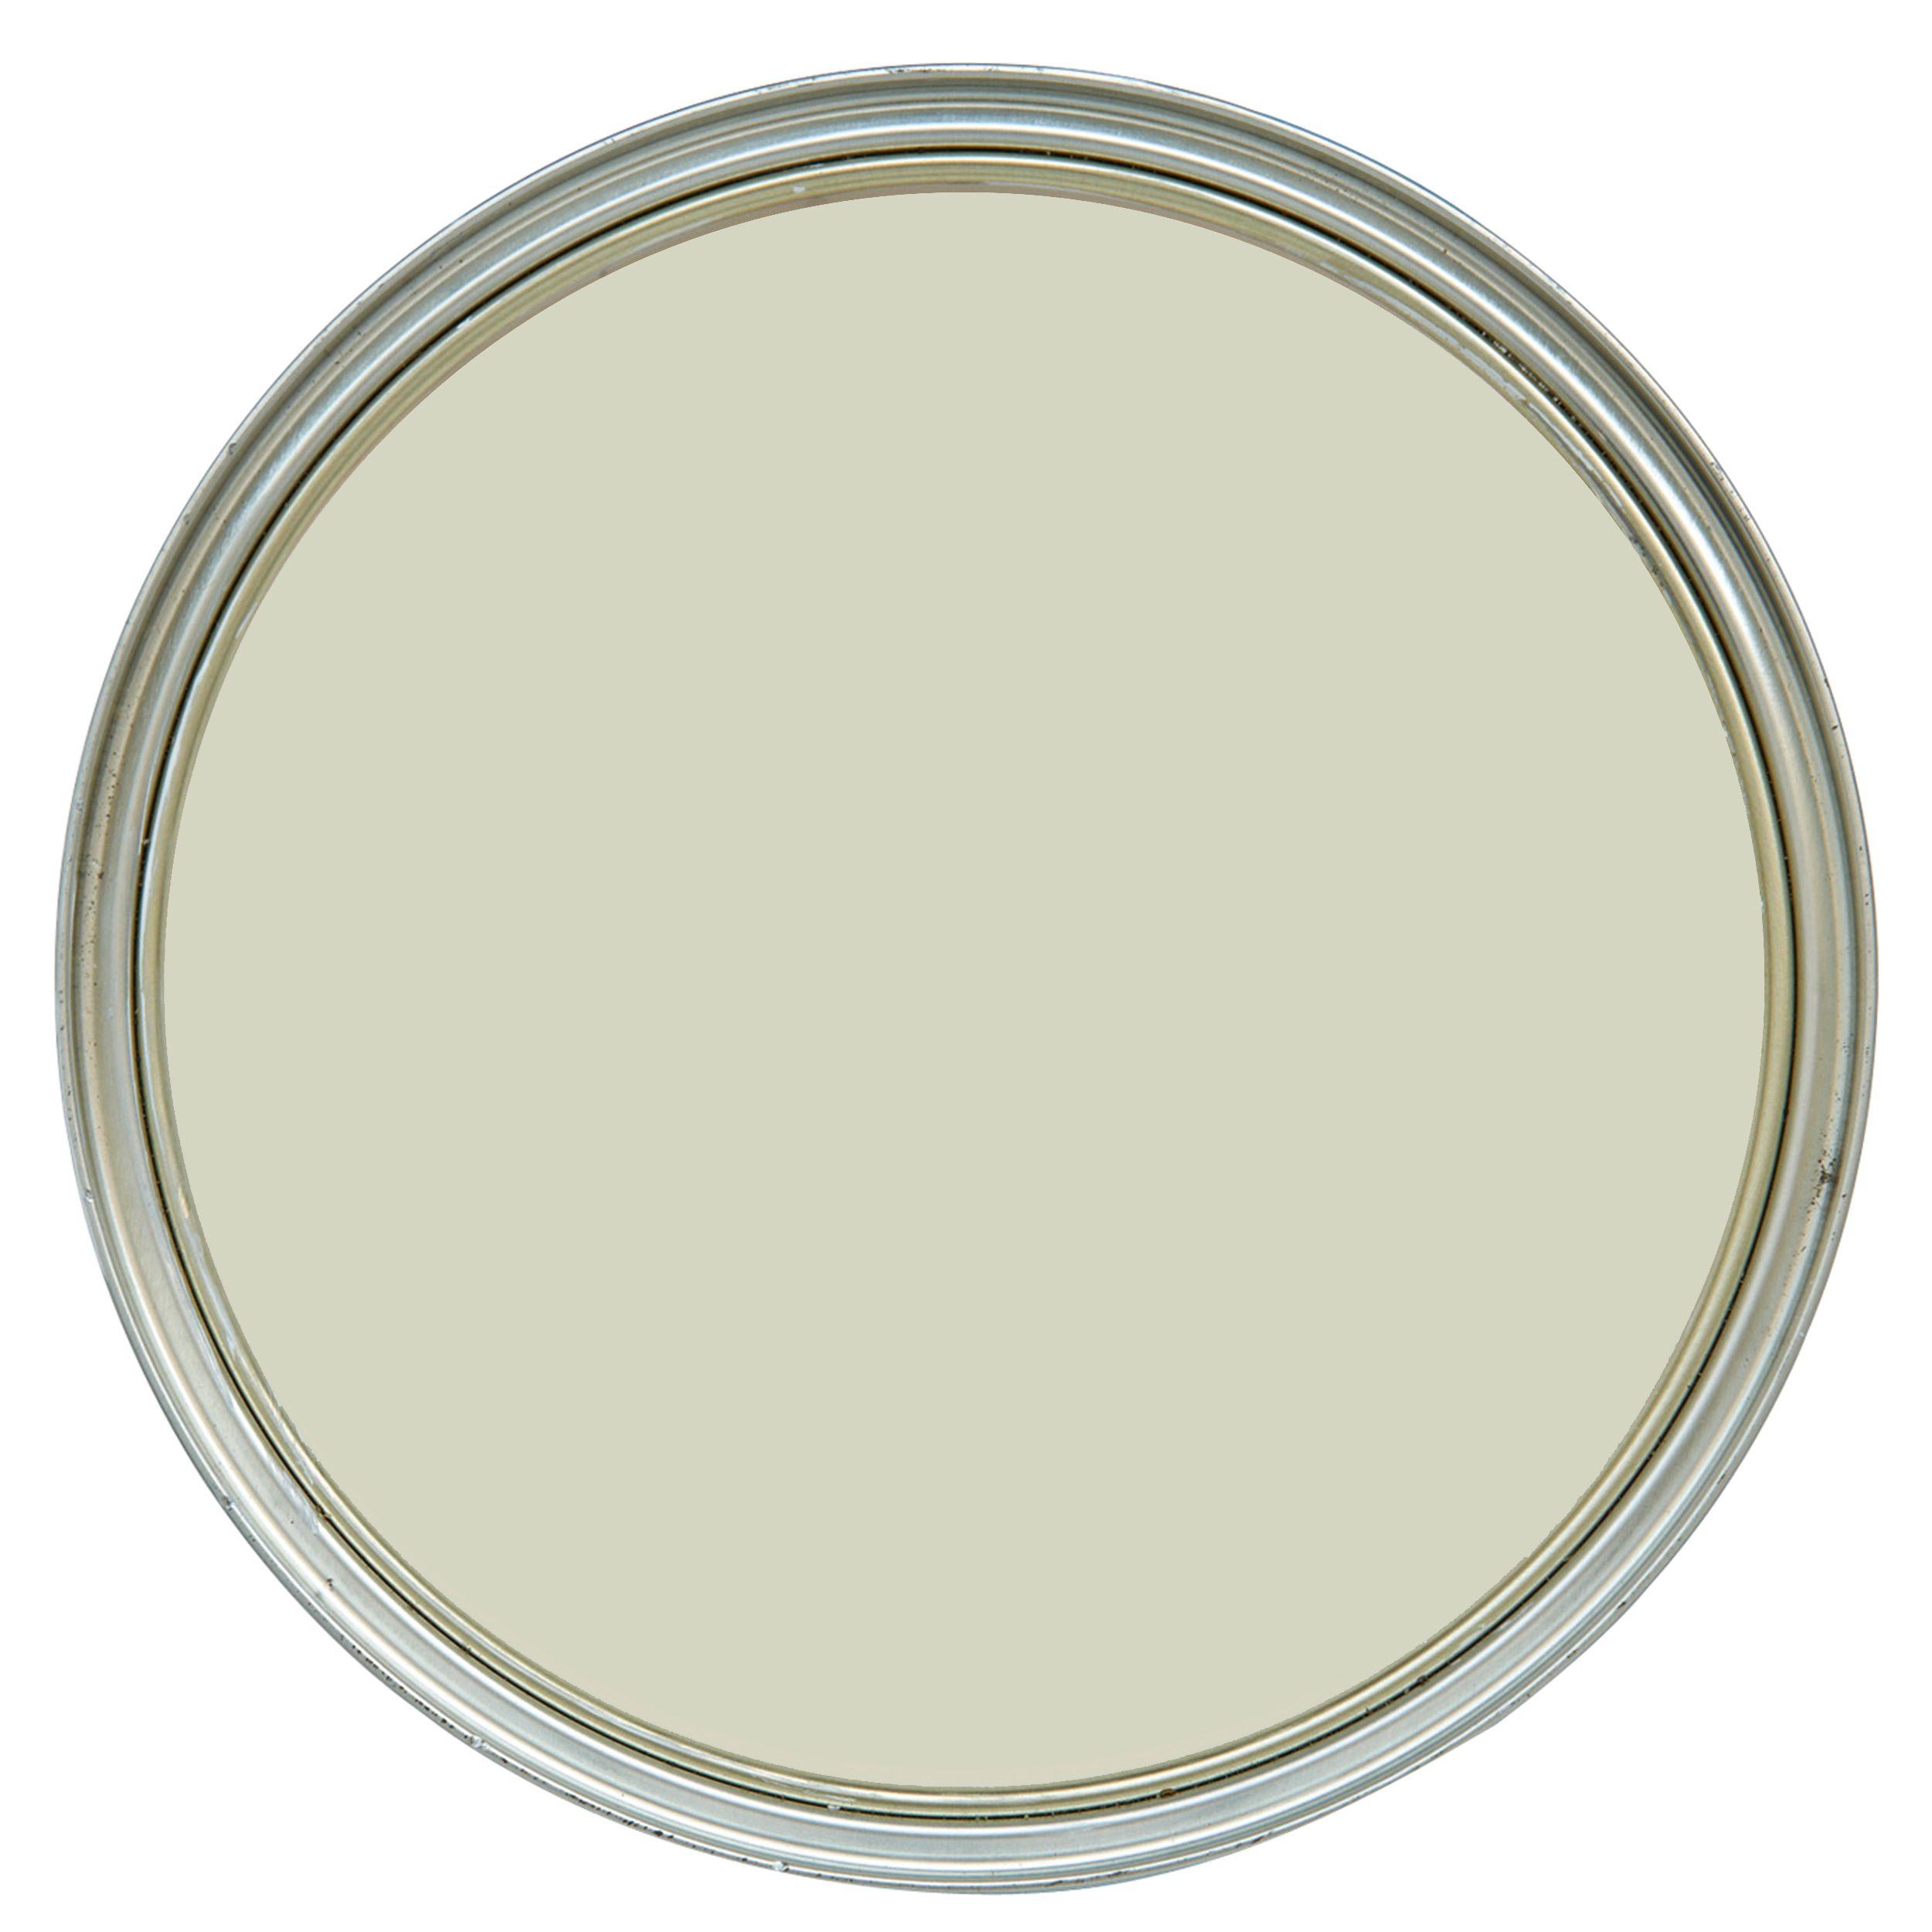 Laura Ashley Paint Pale Sunshine Home Furnishings Decorating Paints Water Based